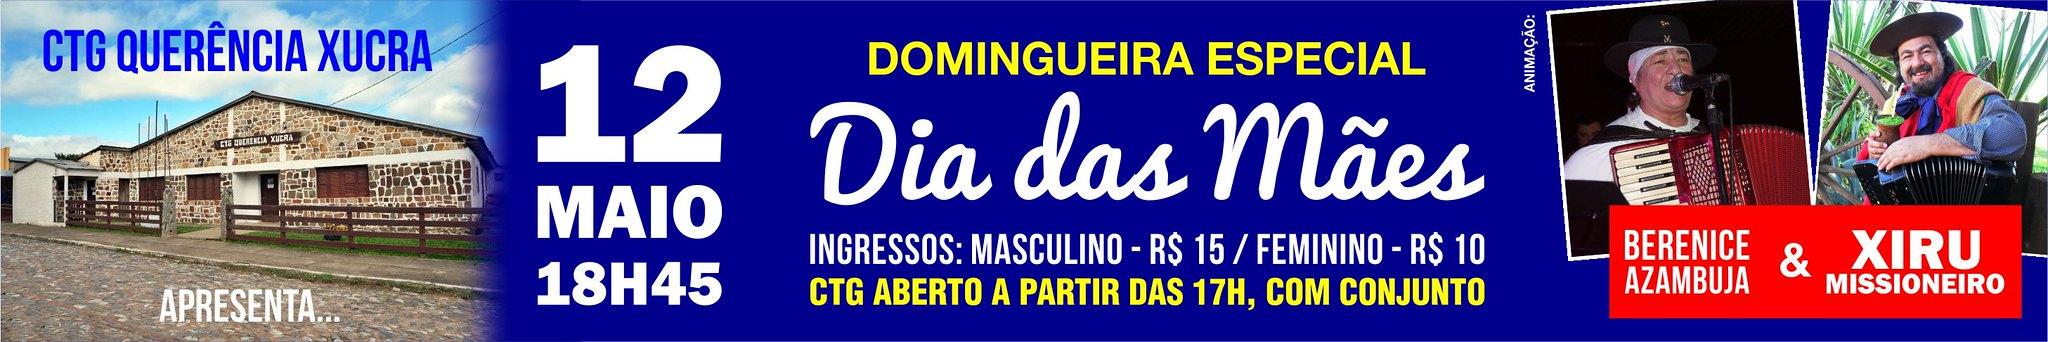 12-05 Domingueira das Mães - CTG Querência Xucra